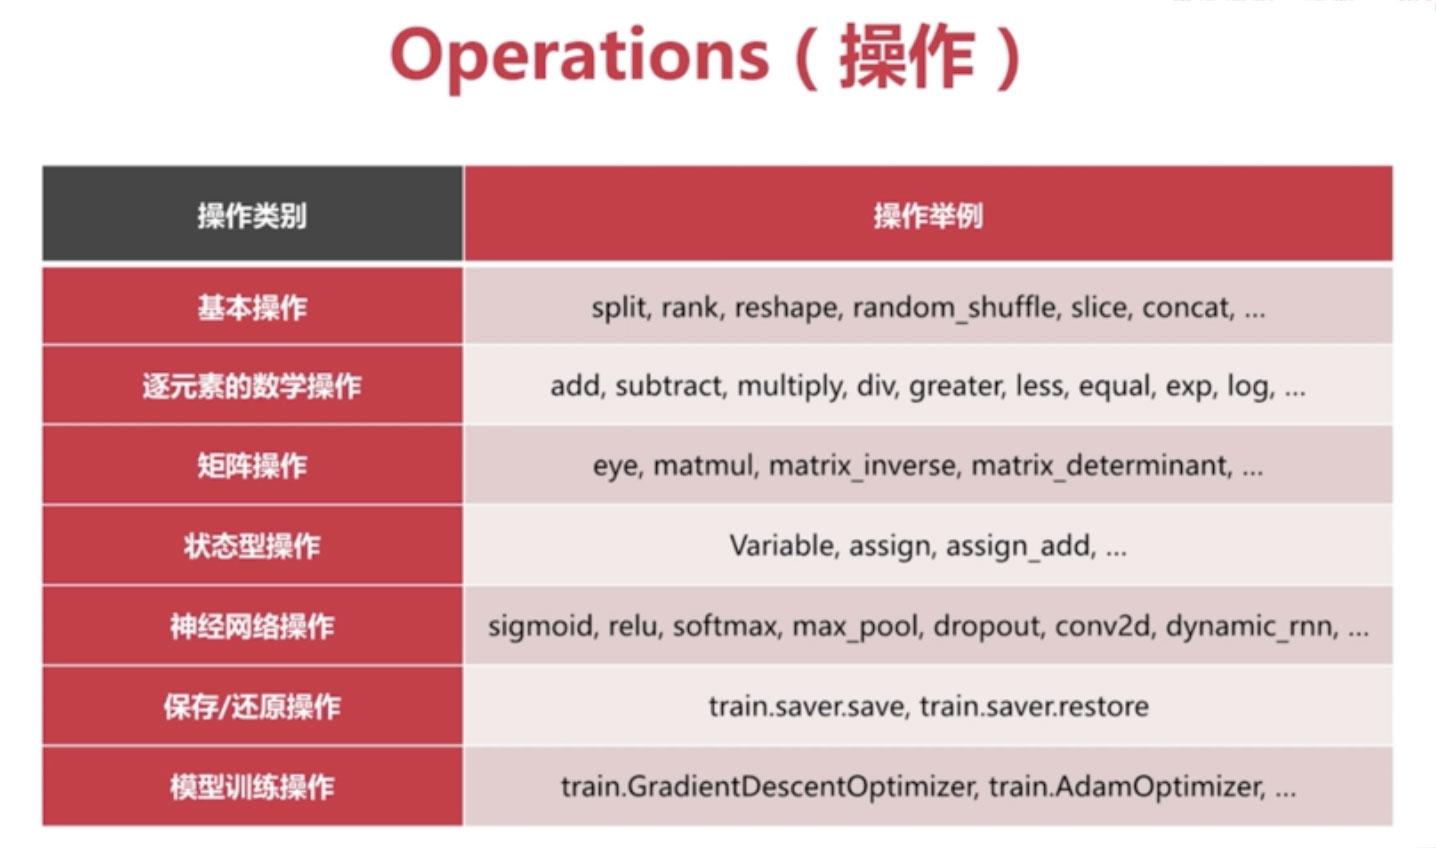 Tensorflow的操作(Operations)